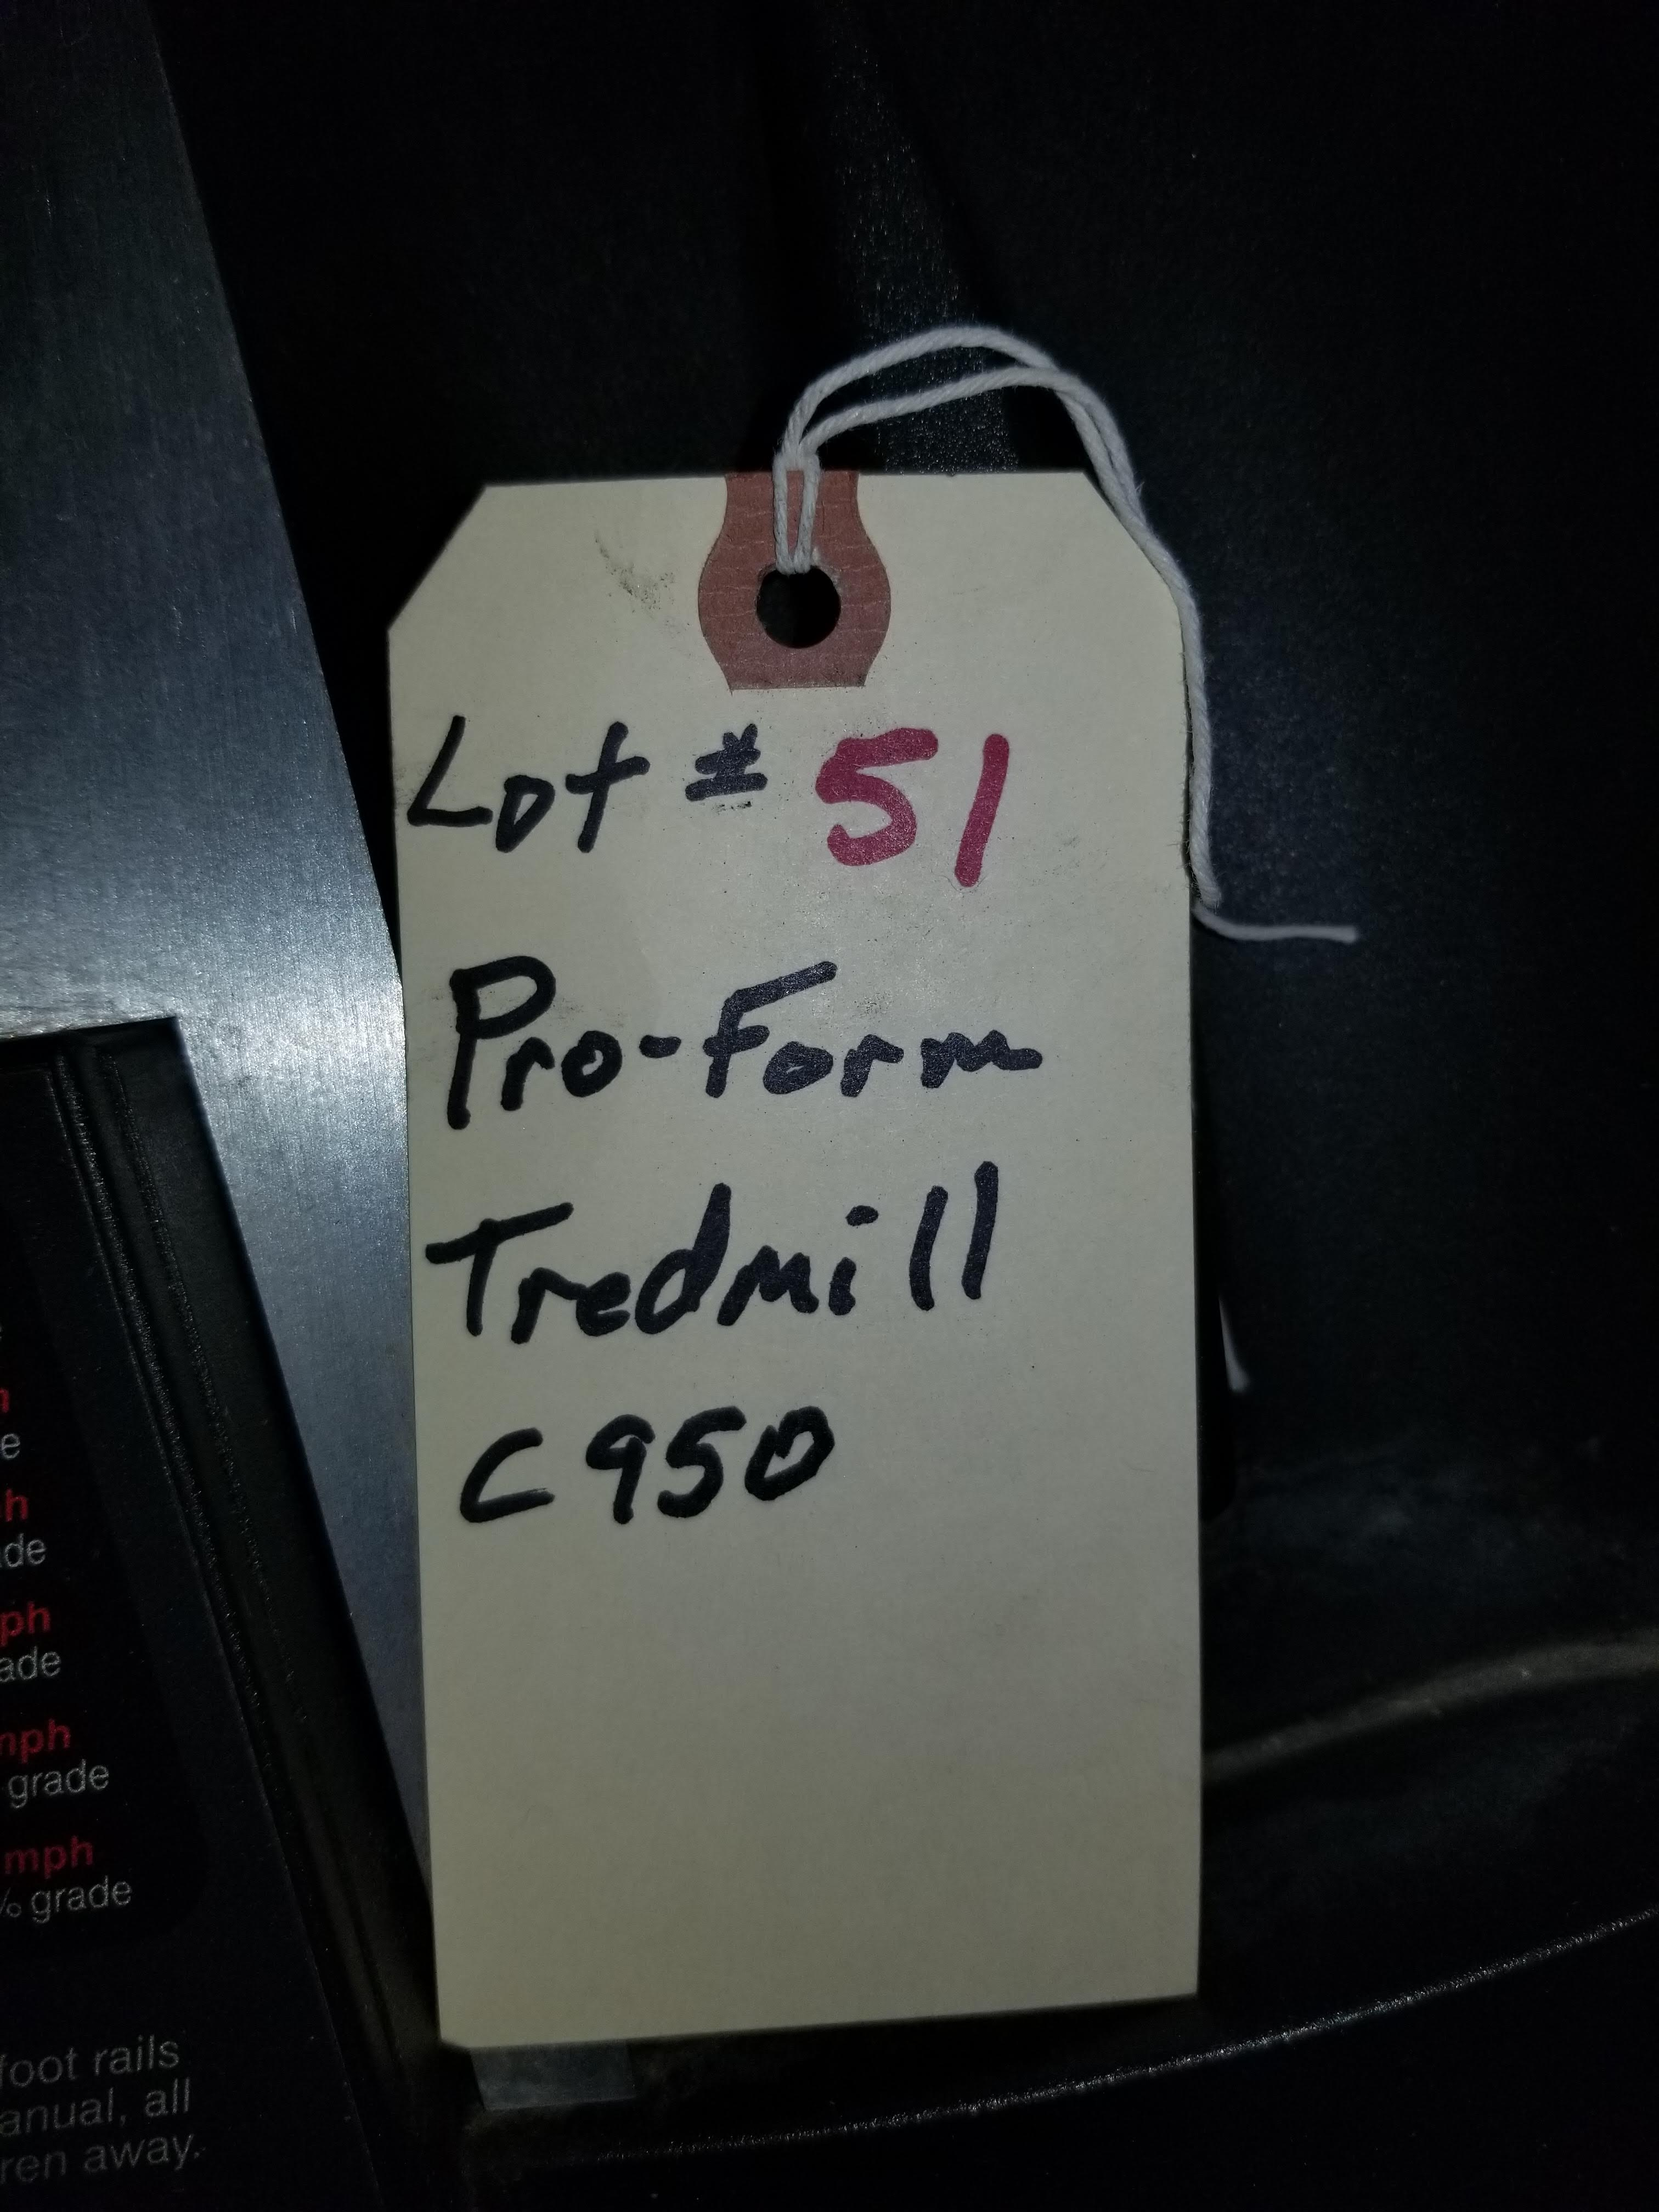 Pro-Form Tredmill C950 - Image 3 of 3